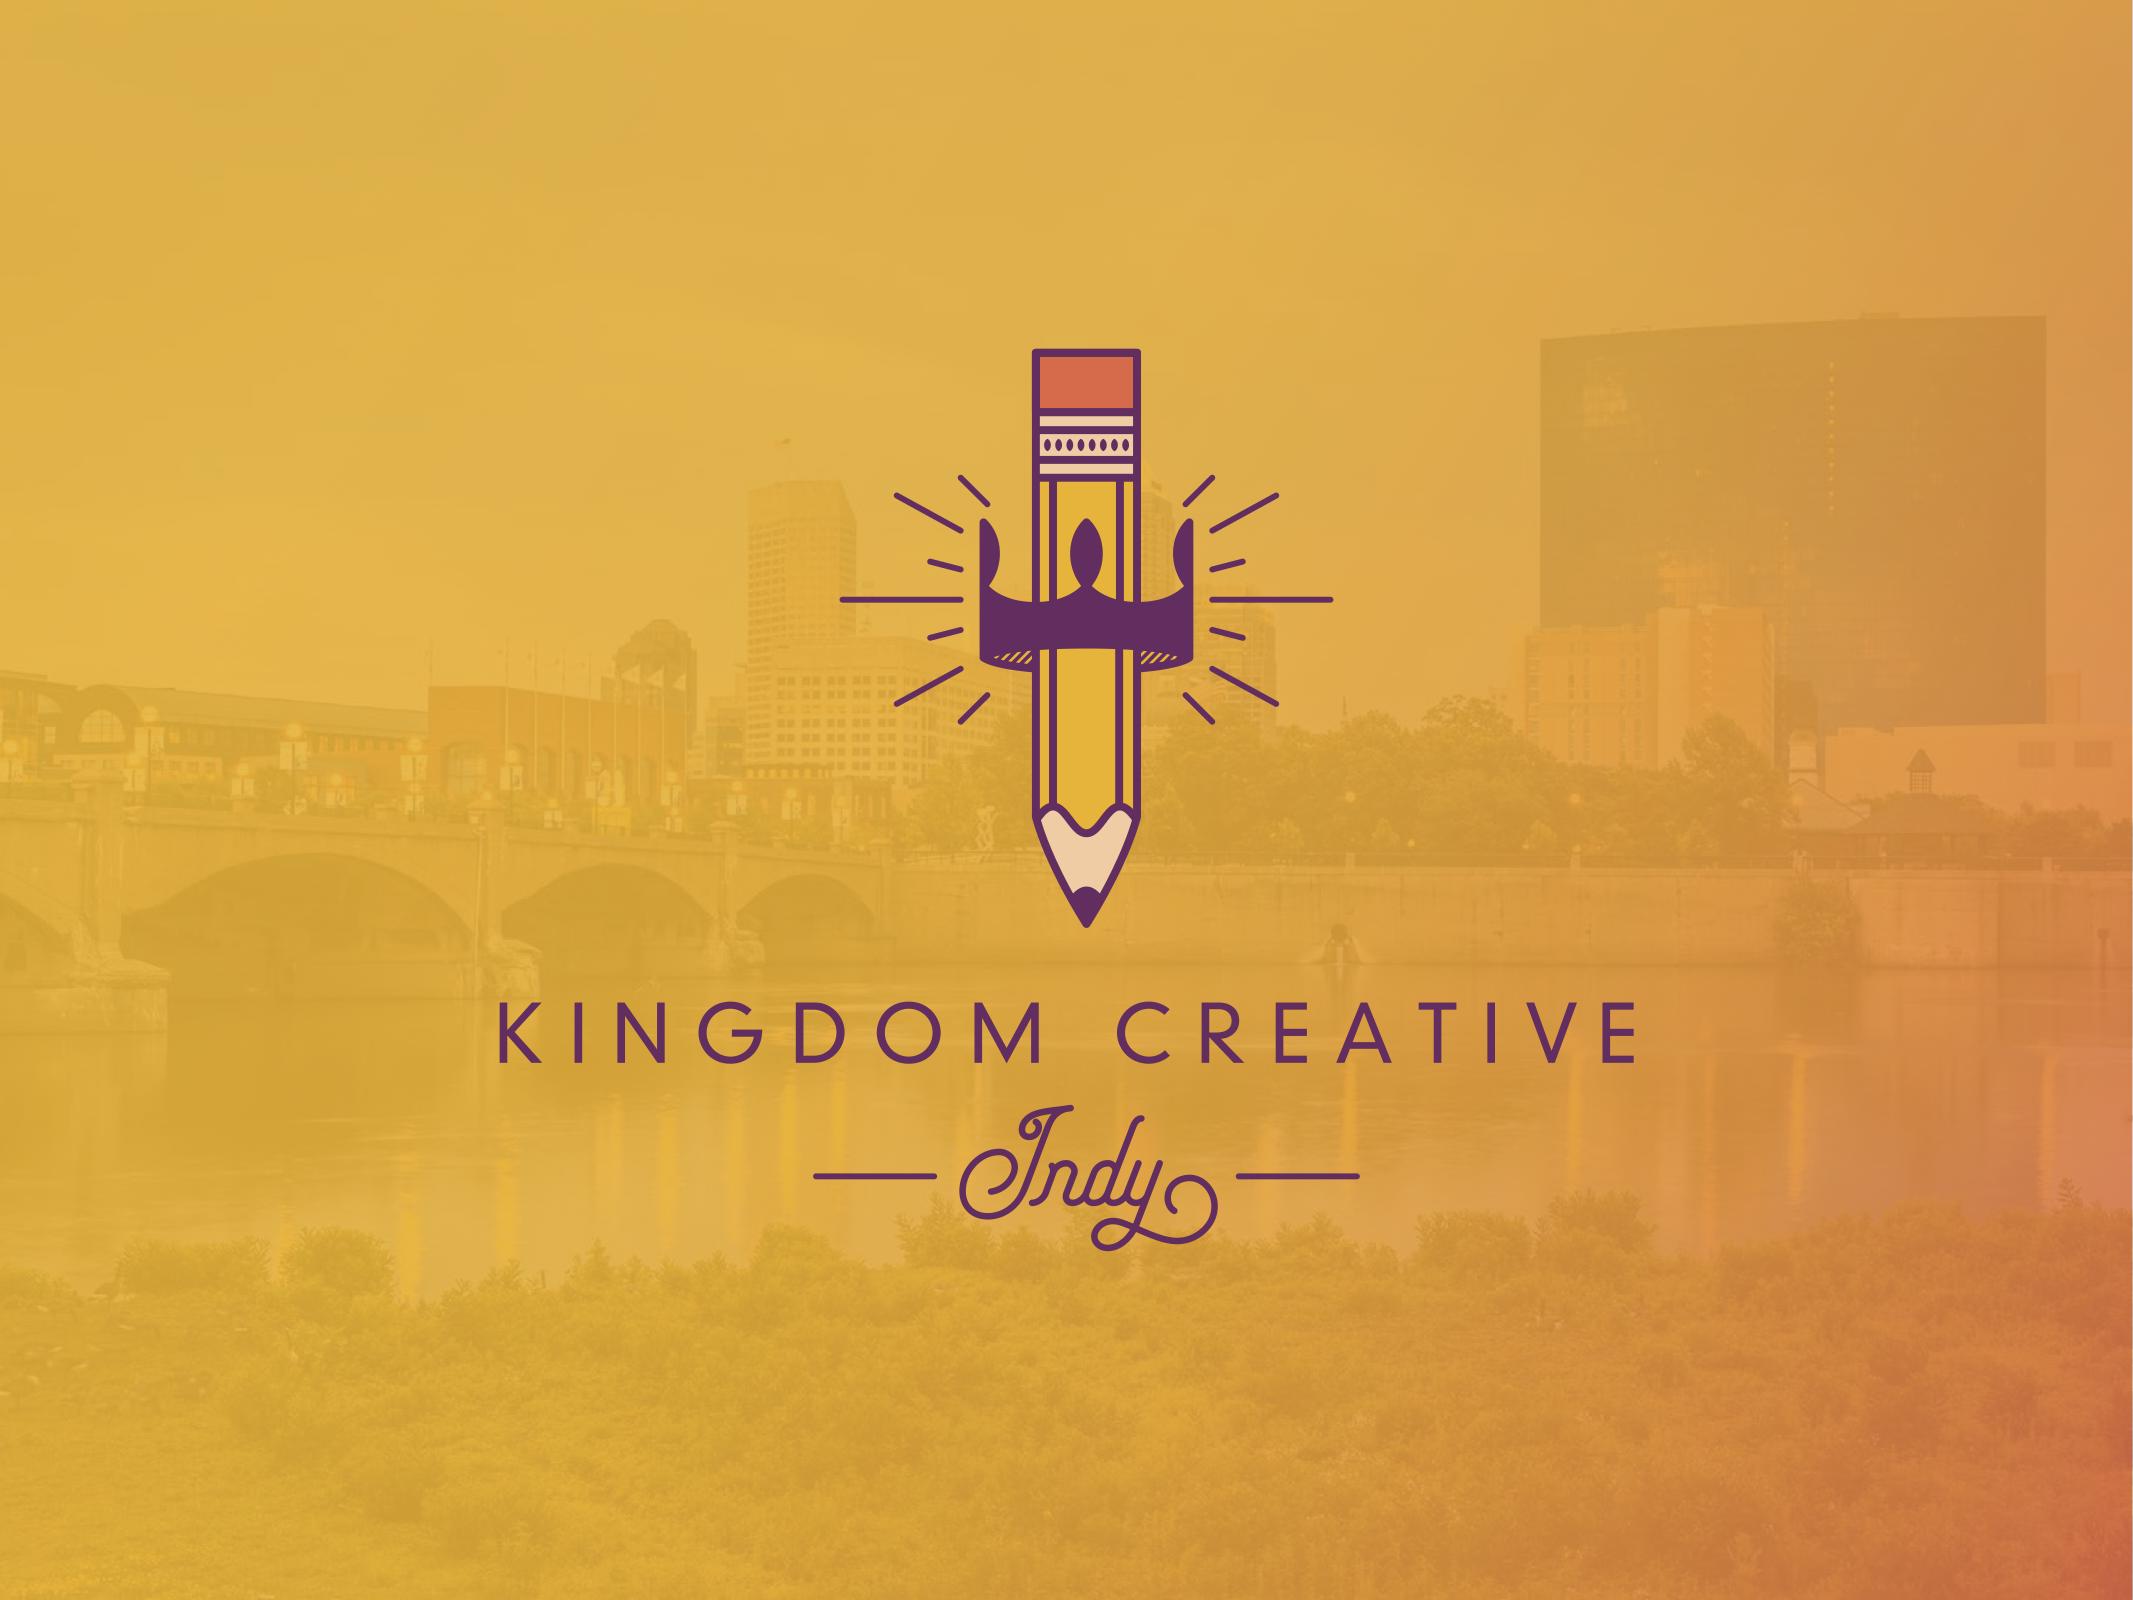 Kingdom_Creative-presentationlow_8-12-18 (1)-1 (dragged).png